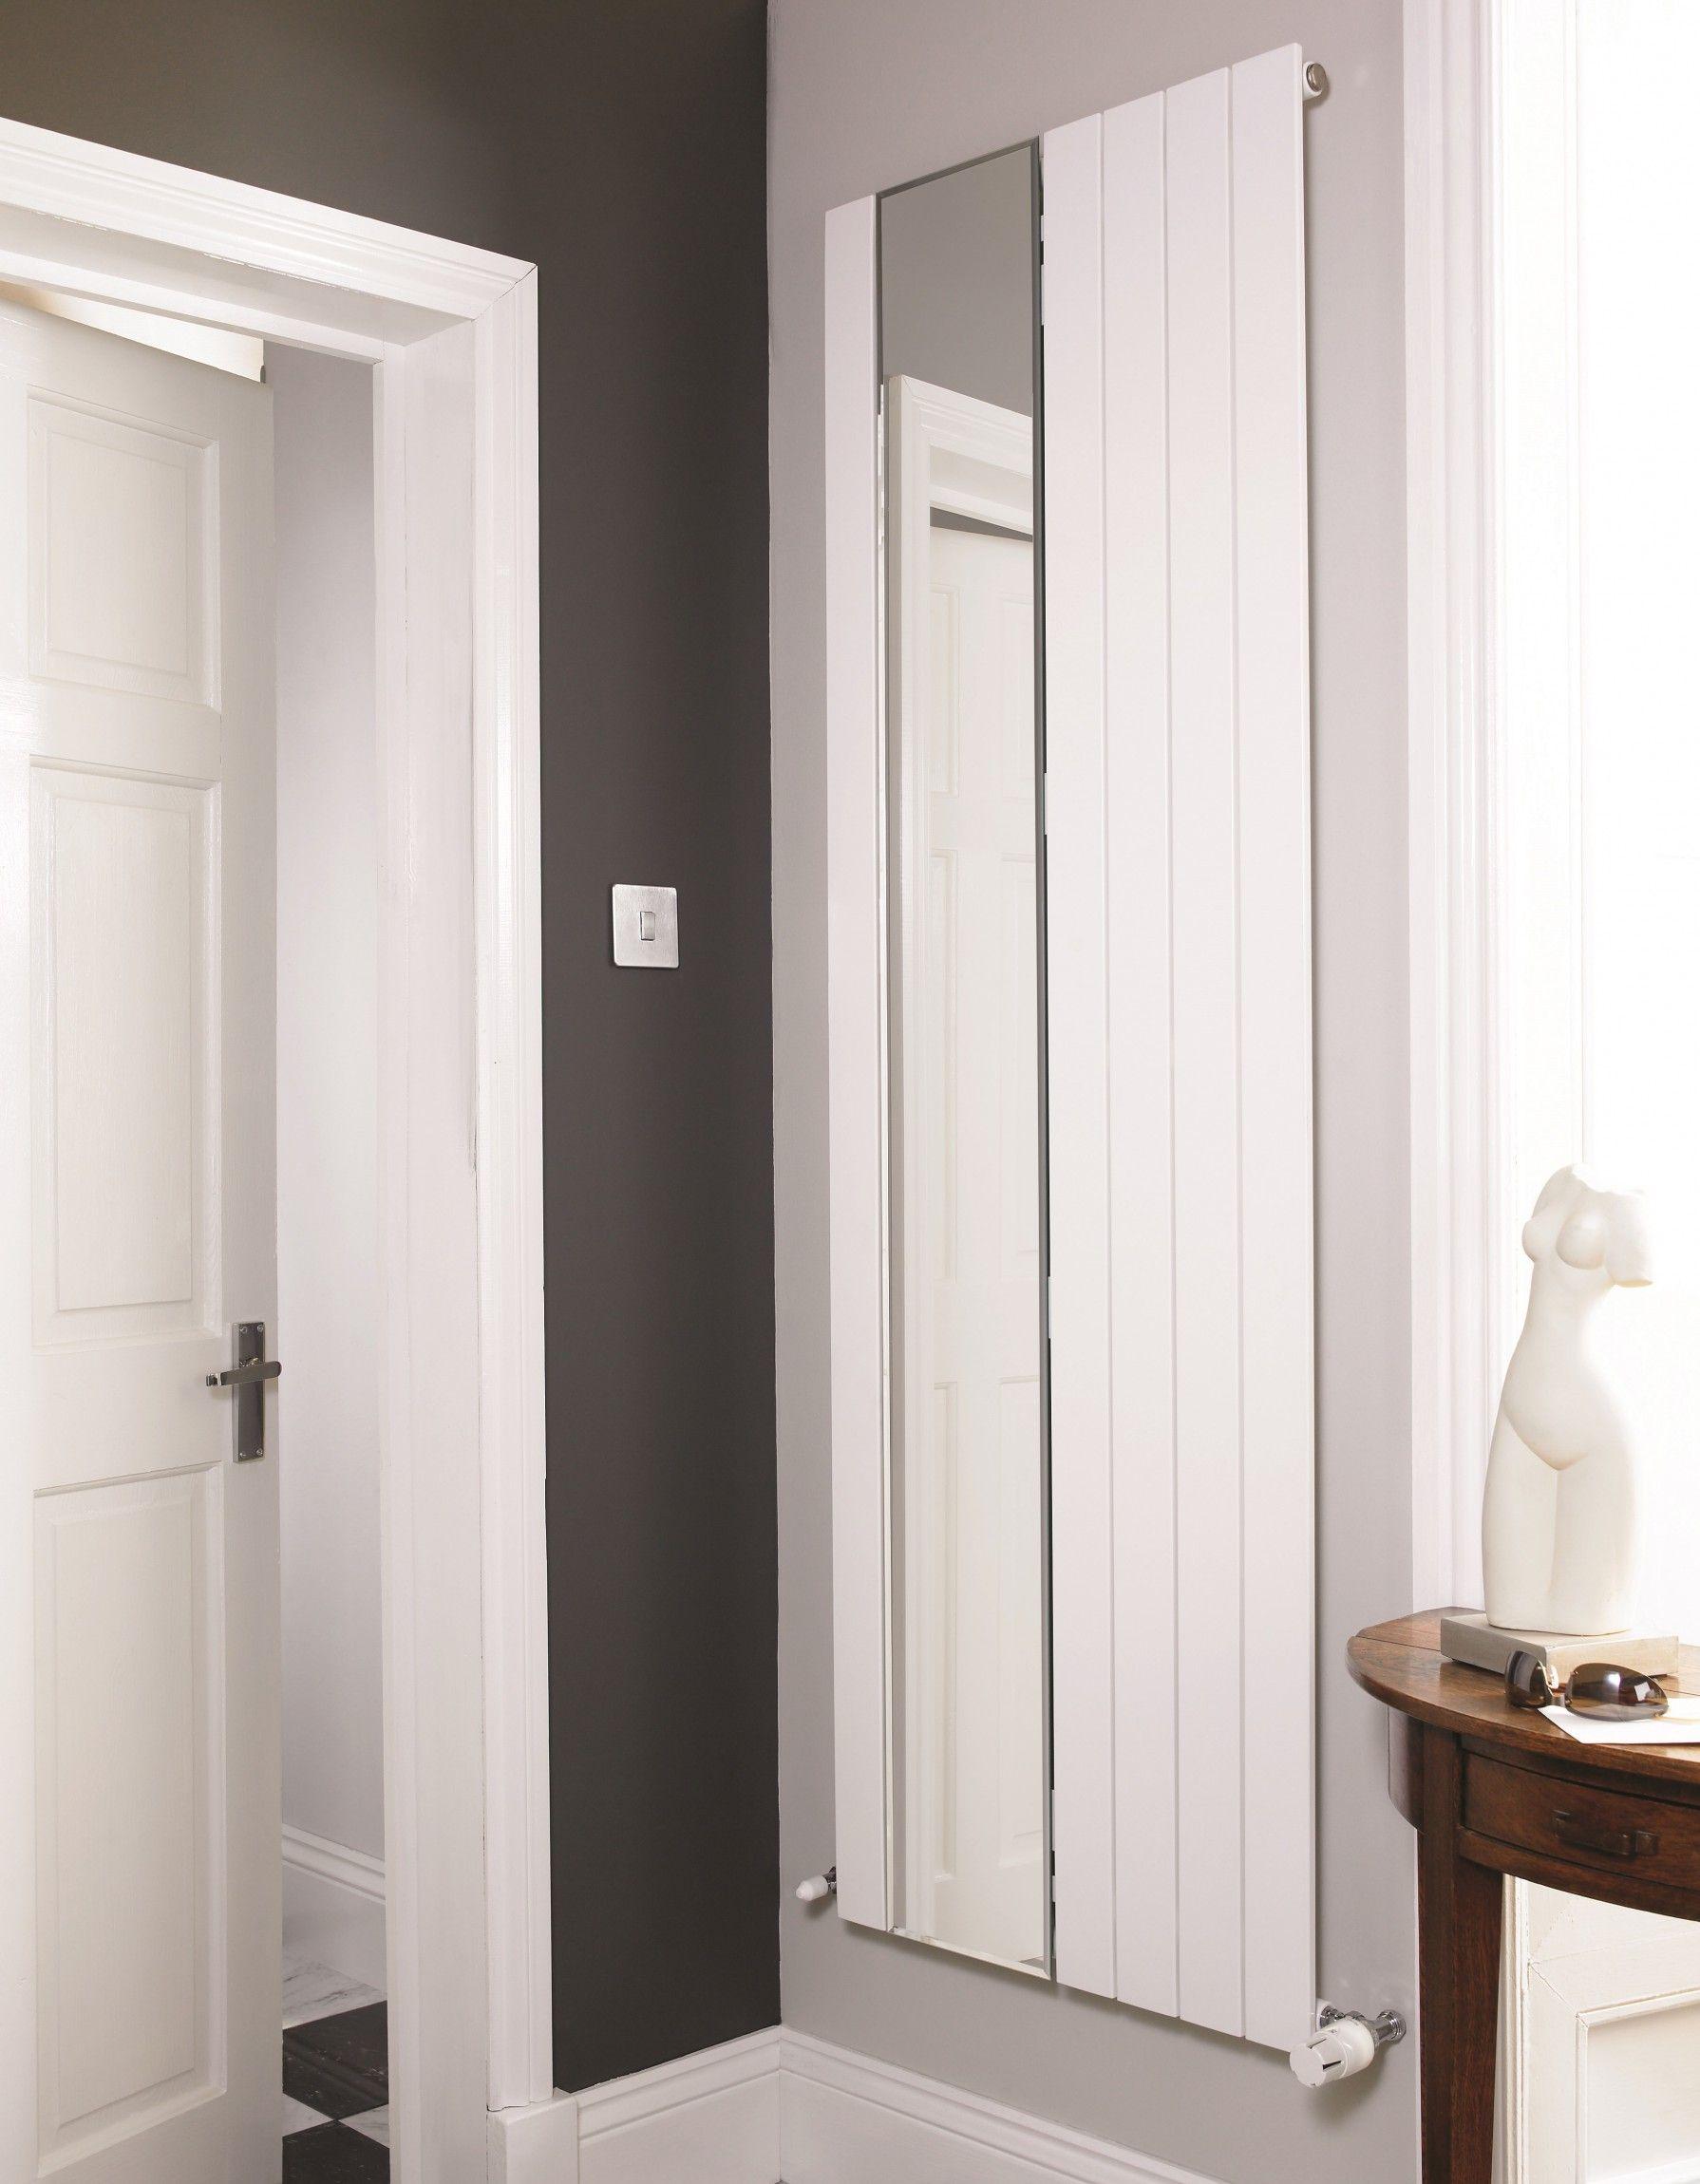 paneelheizk rper mit spiegelfront 180 x ab 44 cm ab 662 watt paneelheizk rper pinterest. Black Bedroom Furniture Sets. Home Design Ideas